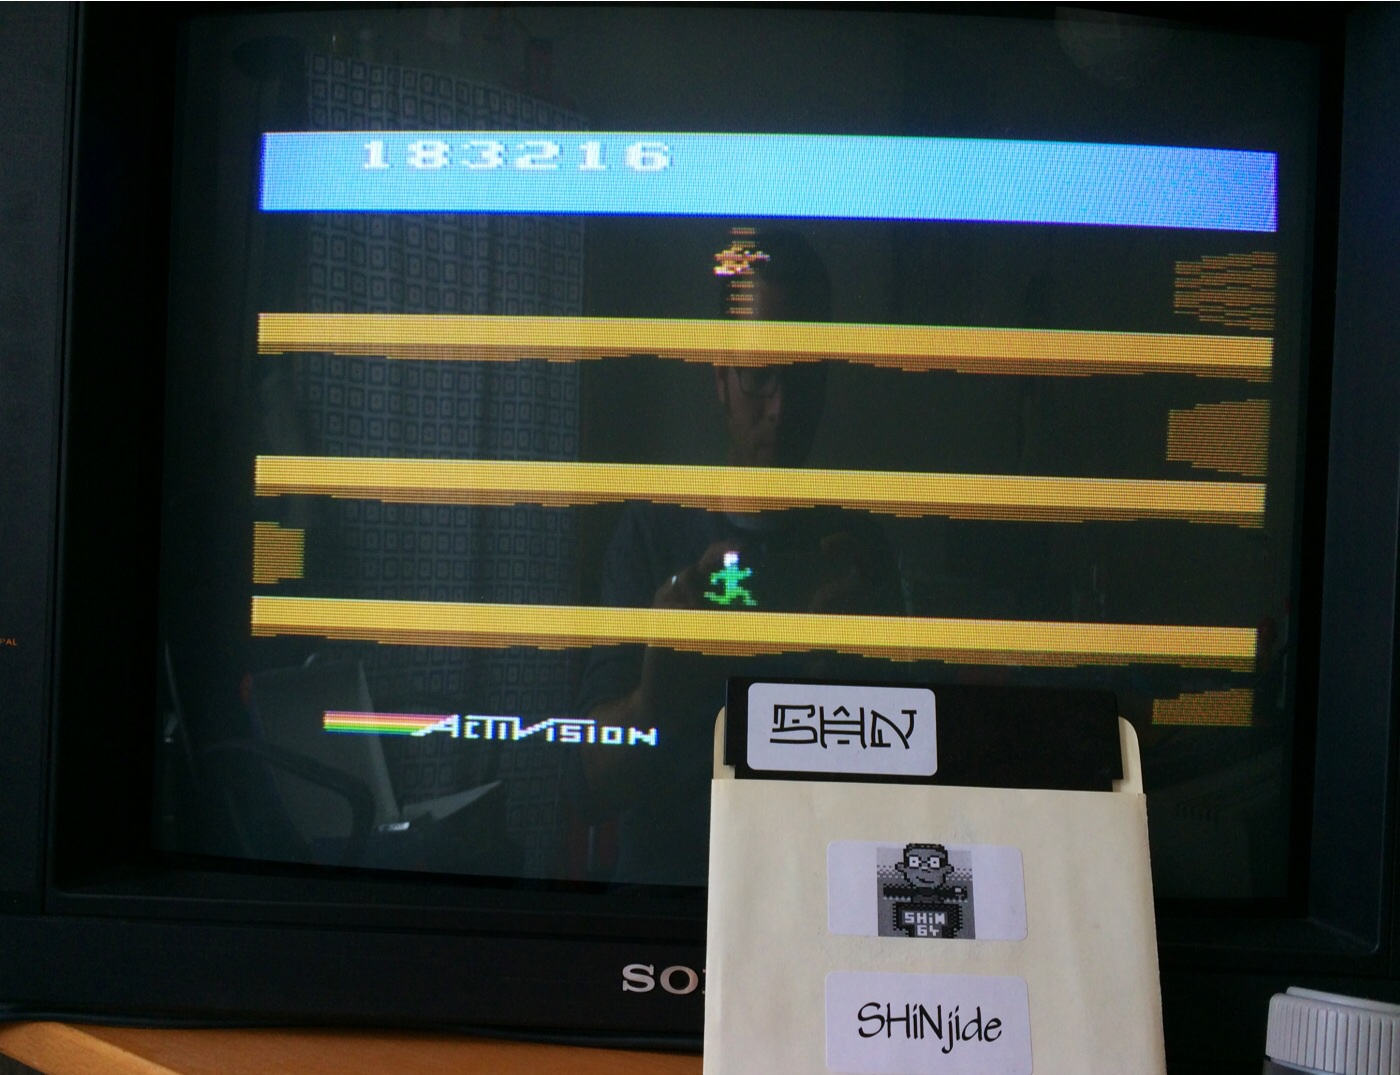 SHiNjide: Pitfall II: Lost Caverns (Atari 2600) 183,216 points on 2014-07-11 07:52:42